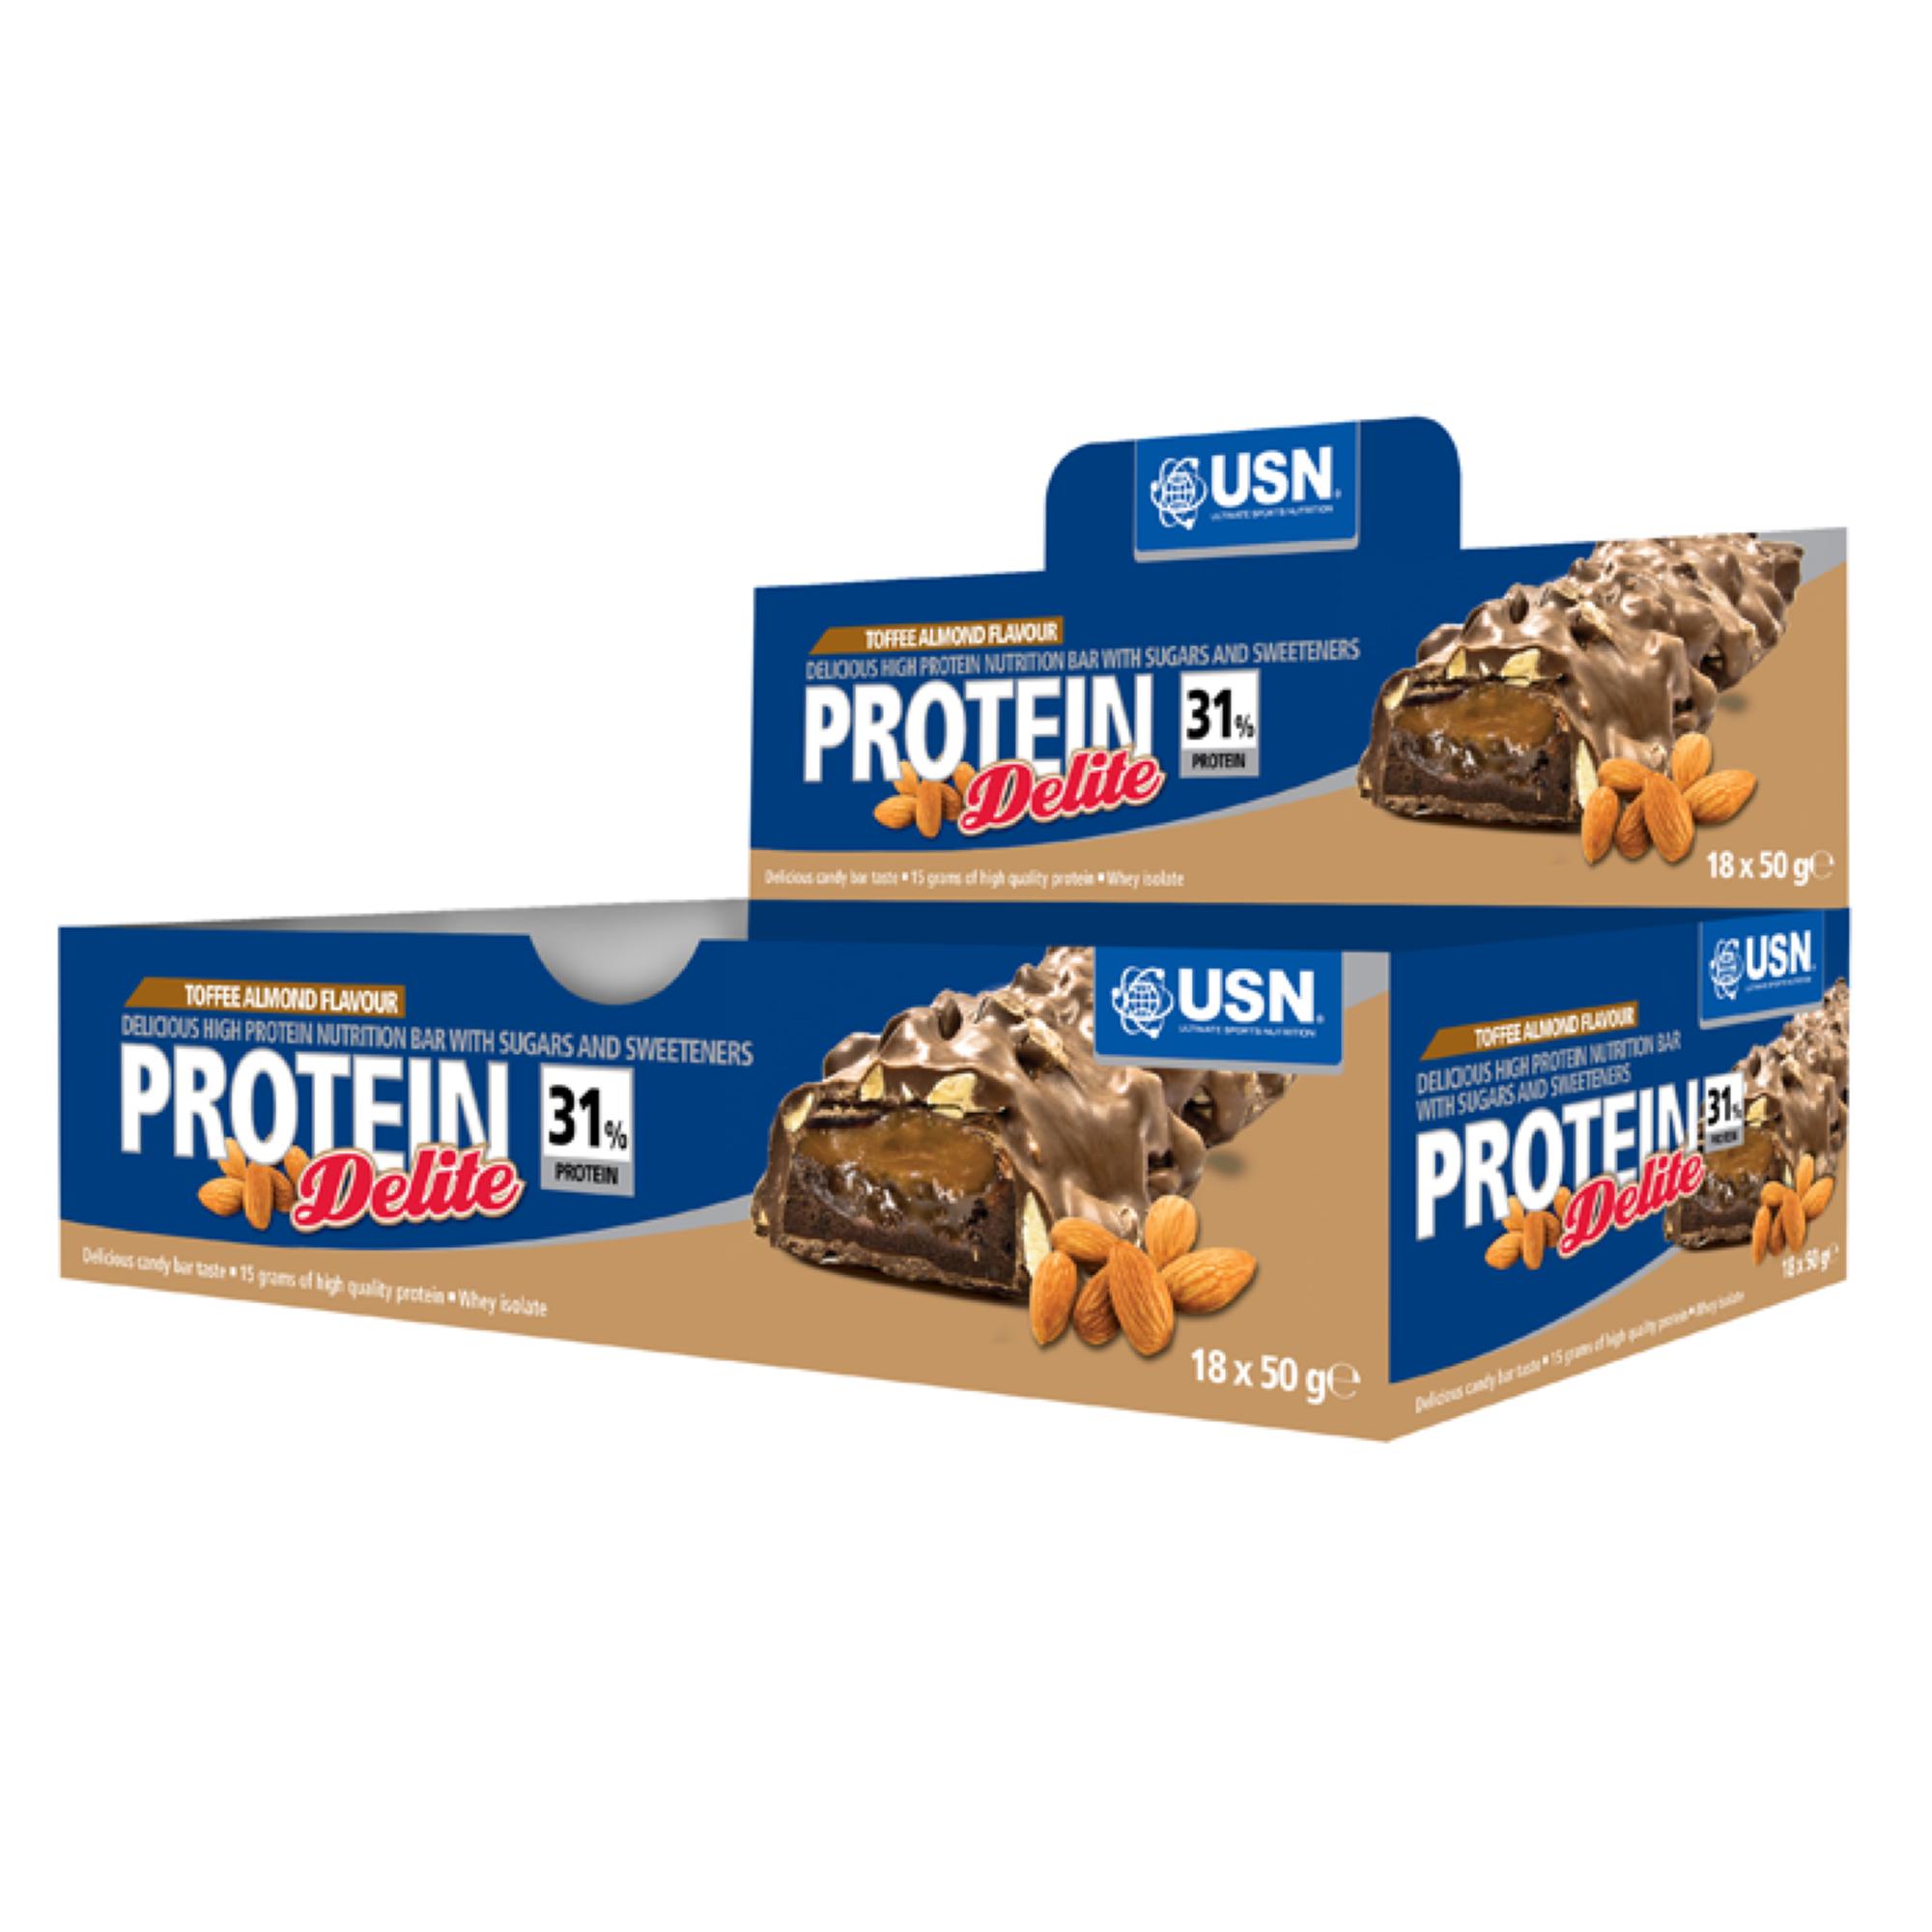 USN Protein Delite USN (Ultimate Sports Nutrition